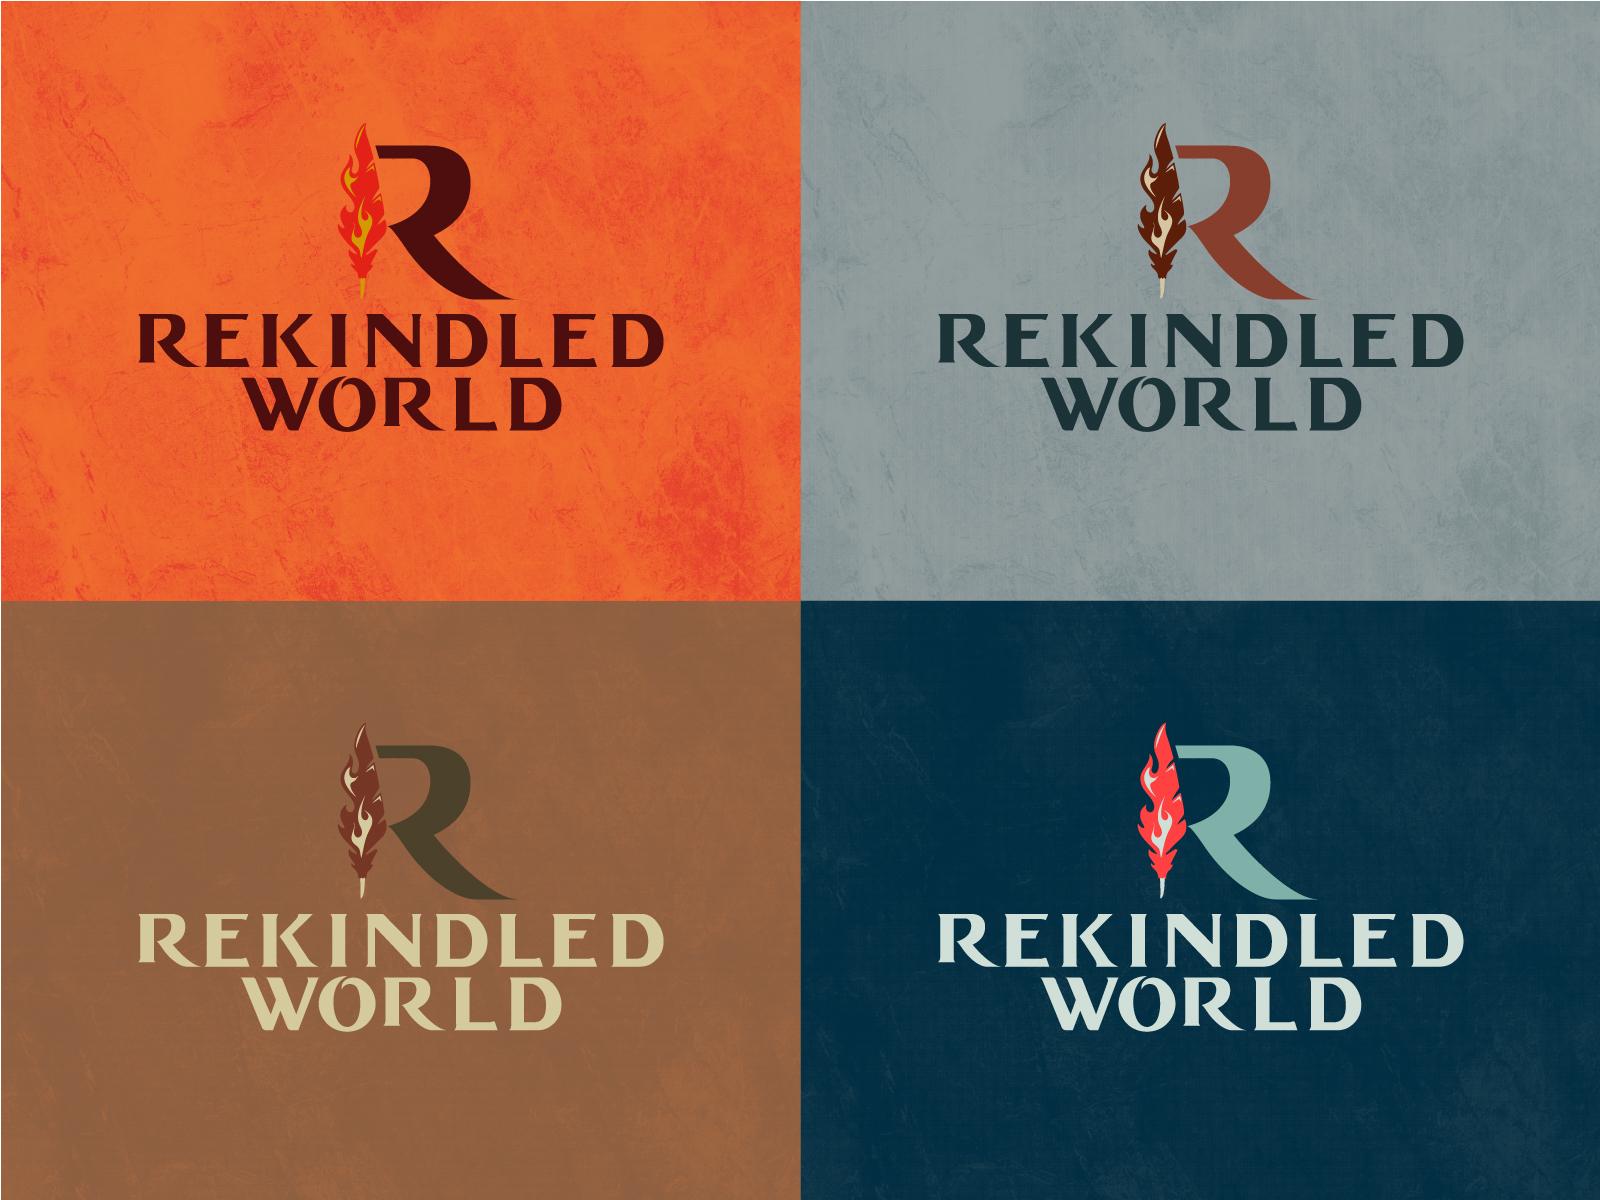 Rekindled world logos r1